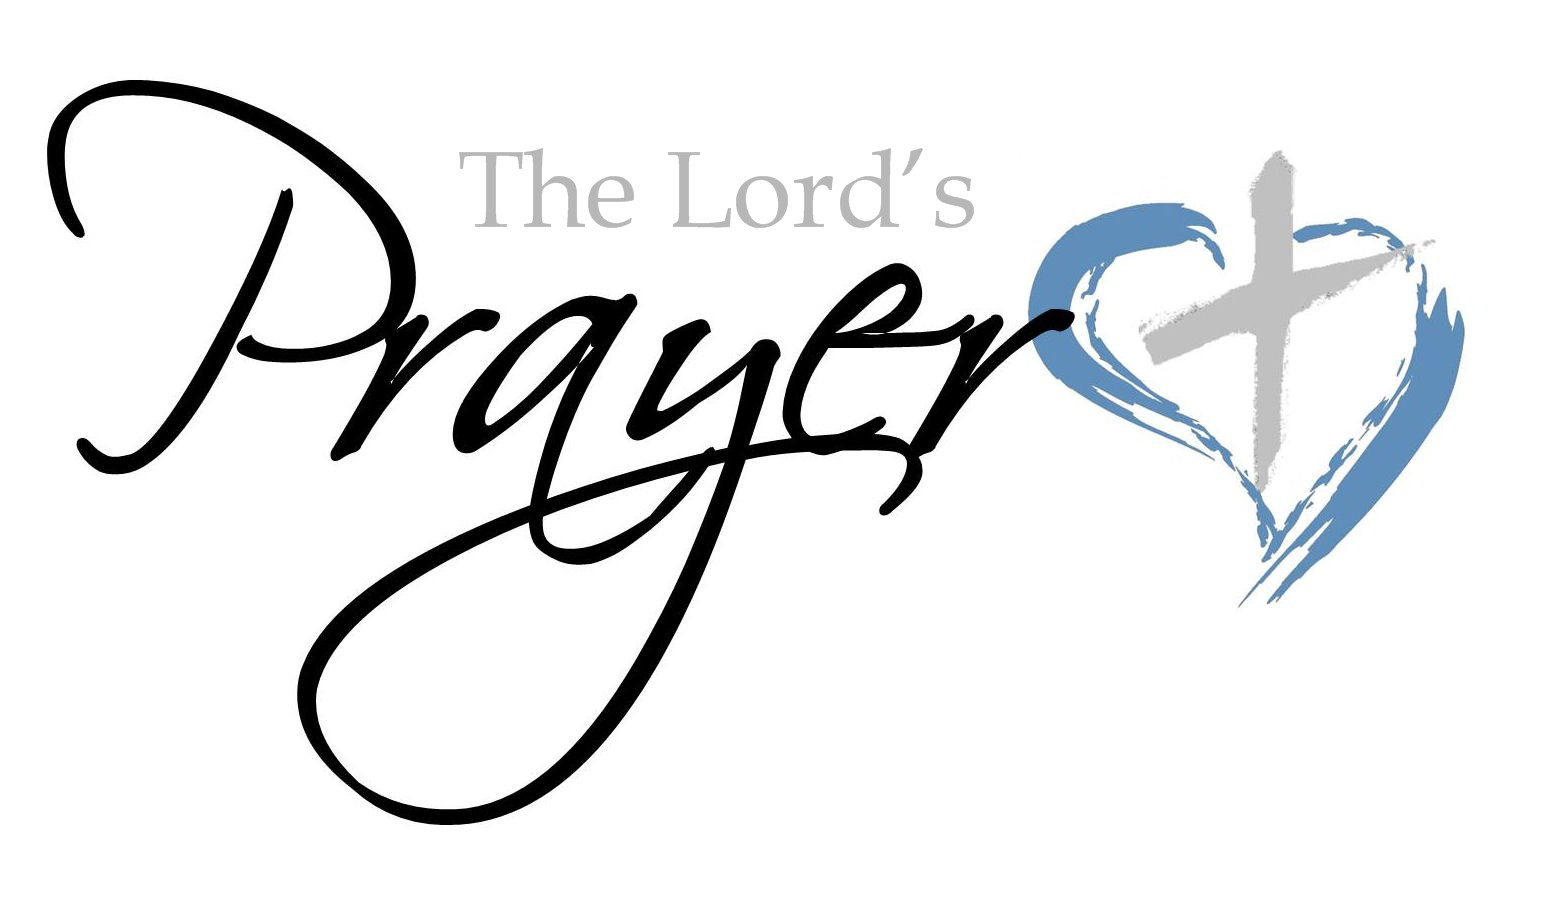 1557x904 Prayer 0 Ideas About Praying Hands Clipart On Praying 2